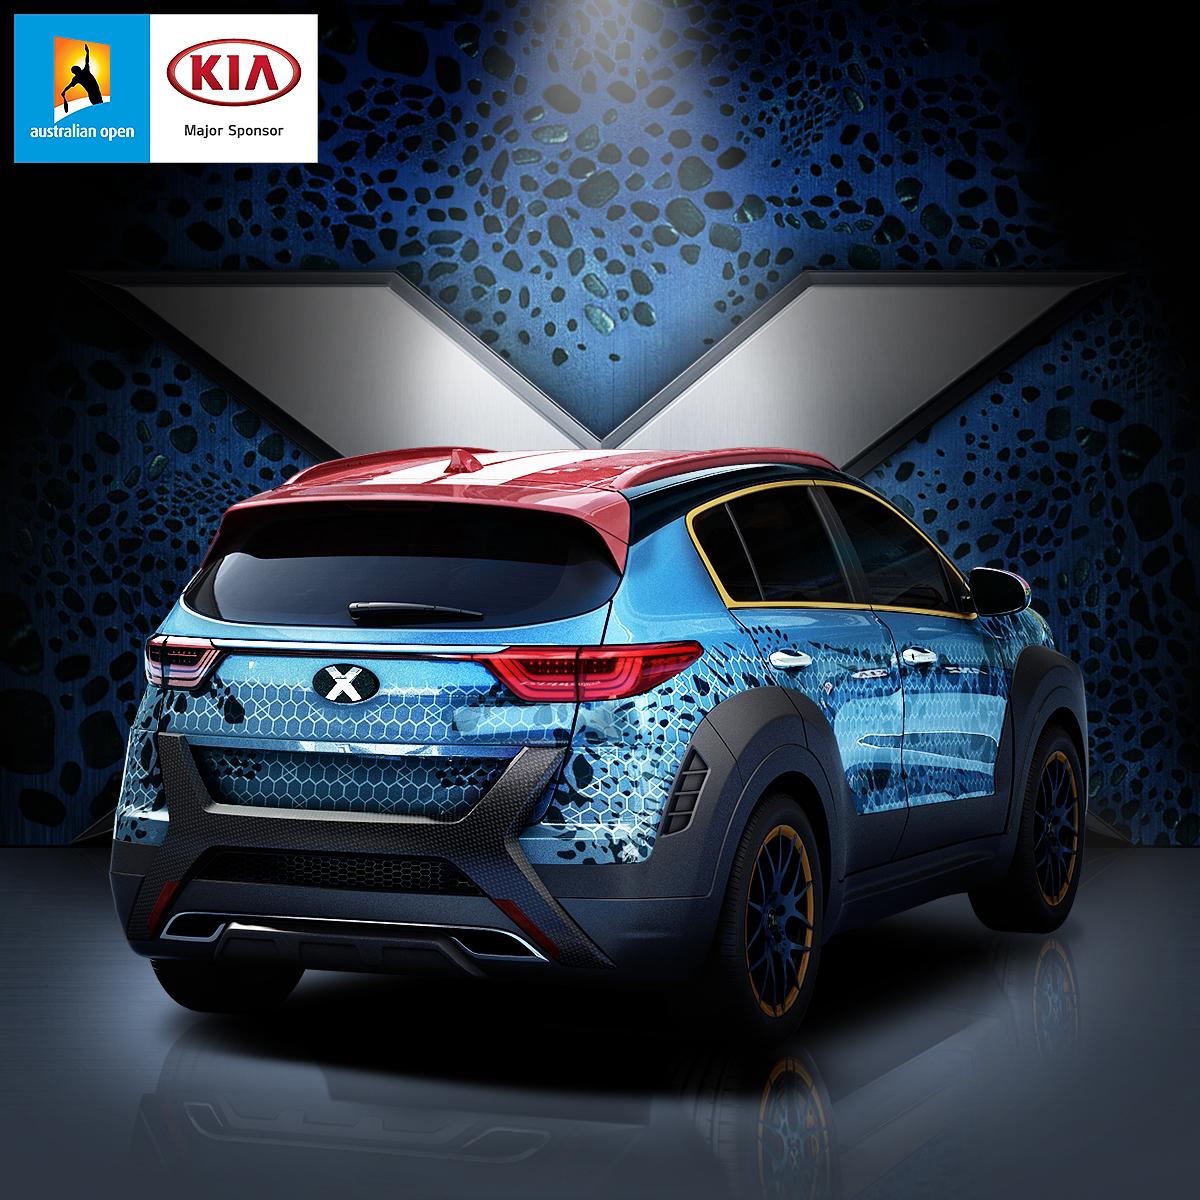 Kia_Sportage_Campaign_Design_Content_02_AO_02_X-Car_Design_04_20151221 (2)